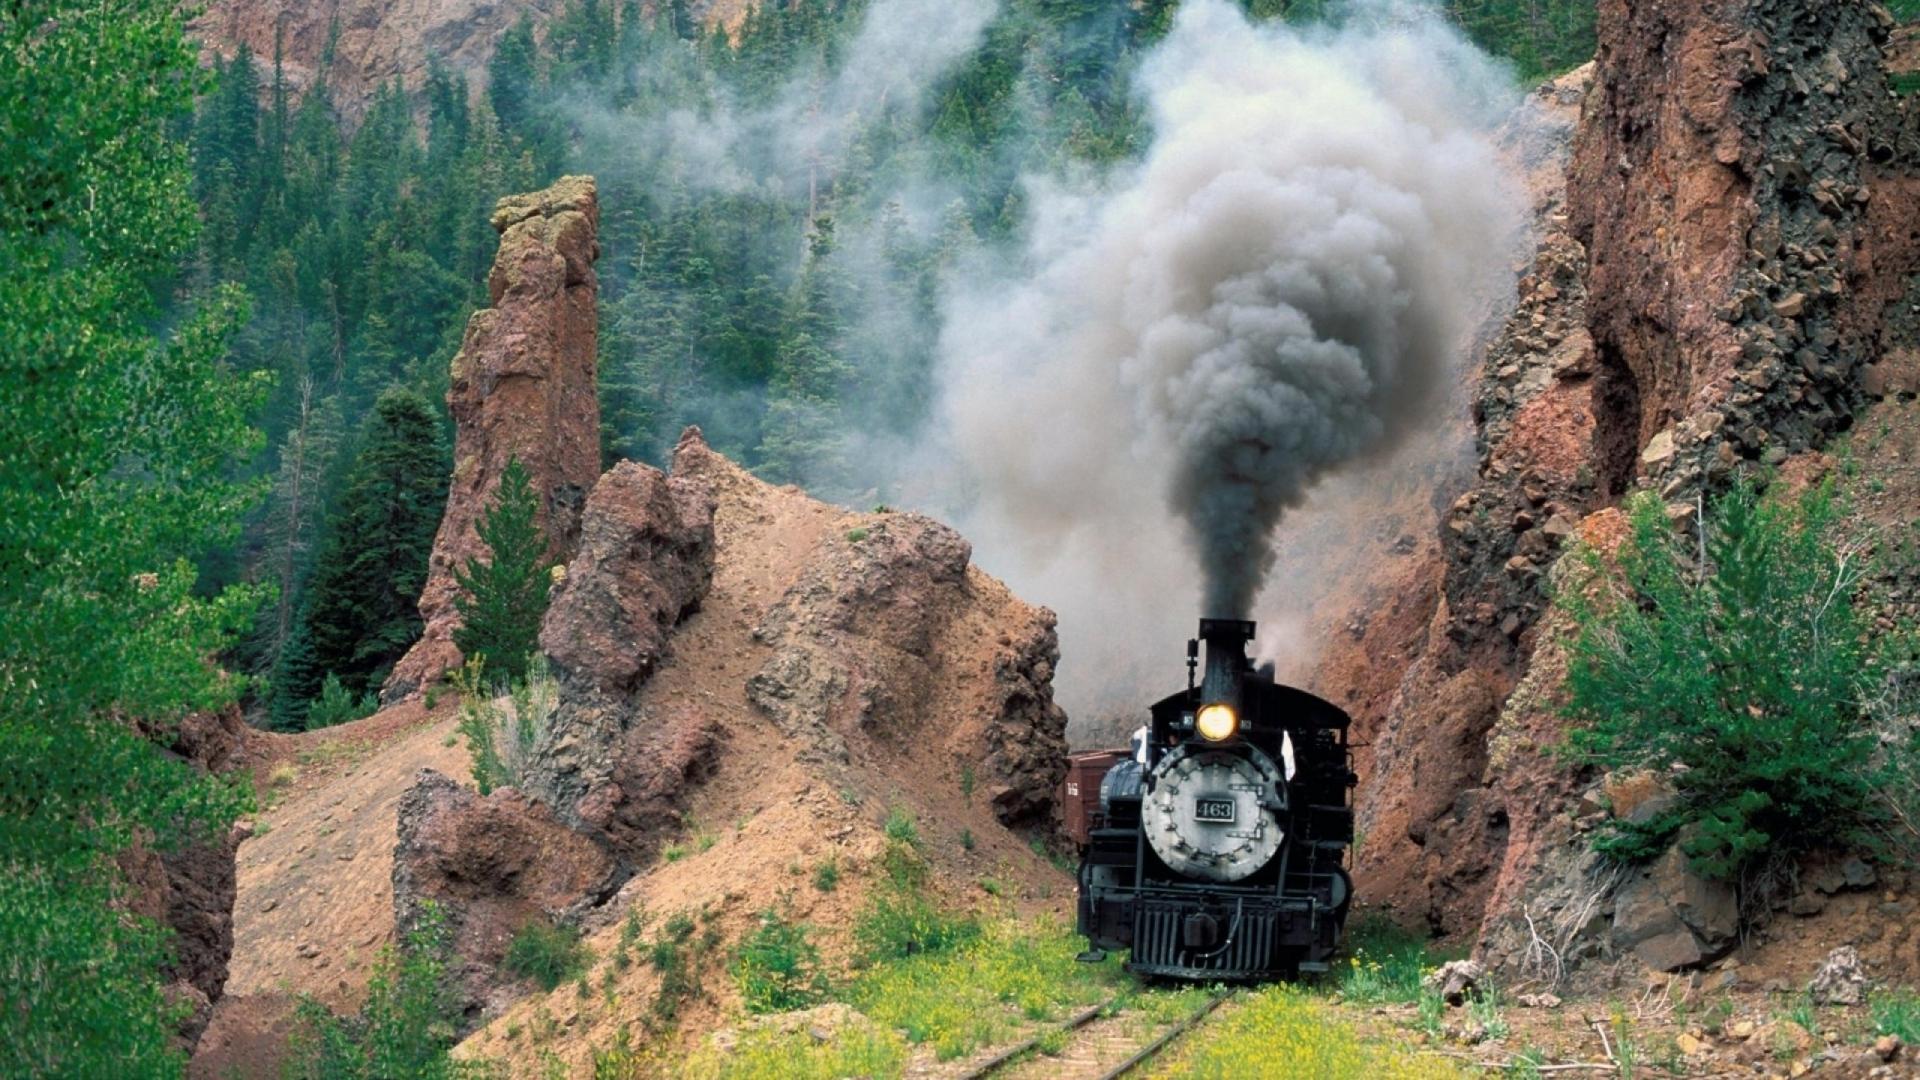 Great Wallpaper Horse High Definition - train_smoke_mountains_grass_79238_1920x1080  Gallery_4350.jpg